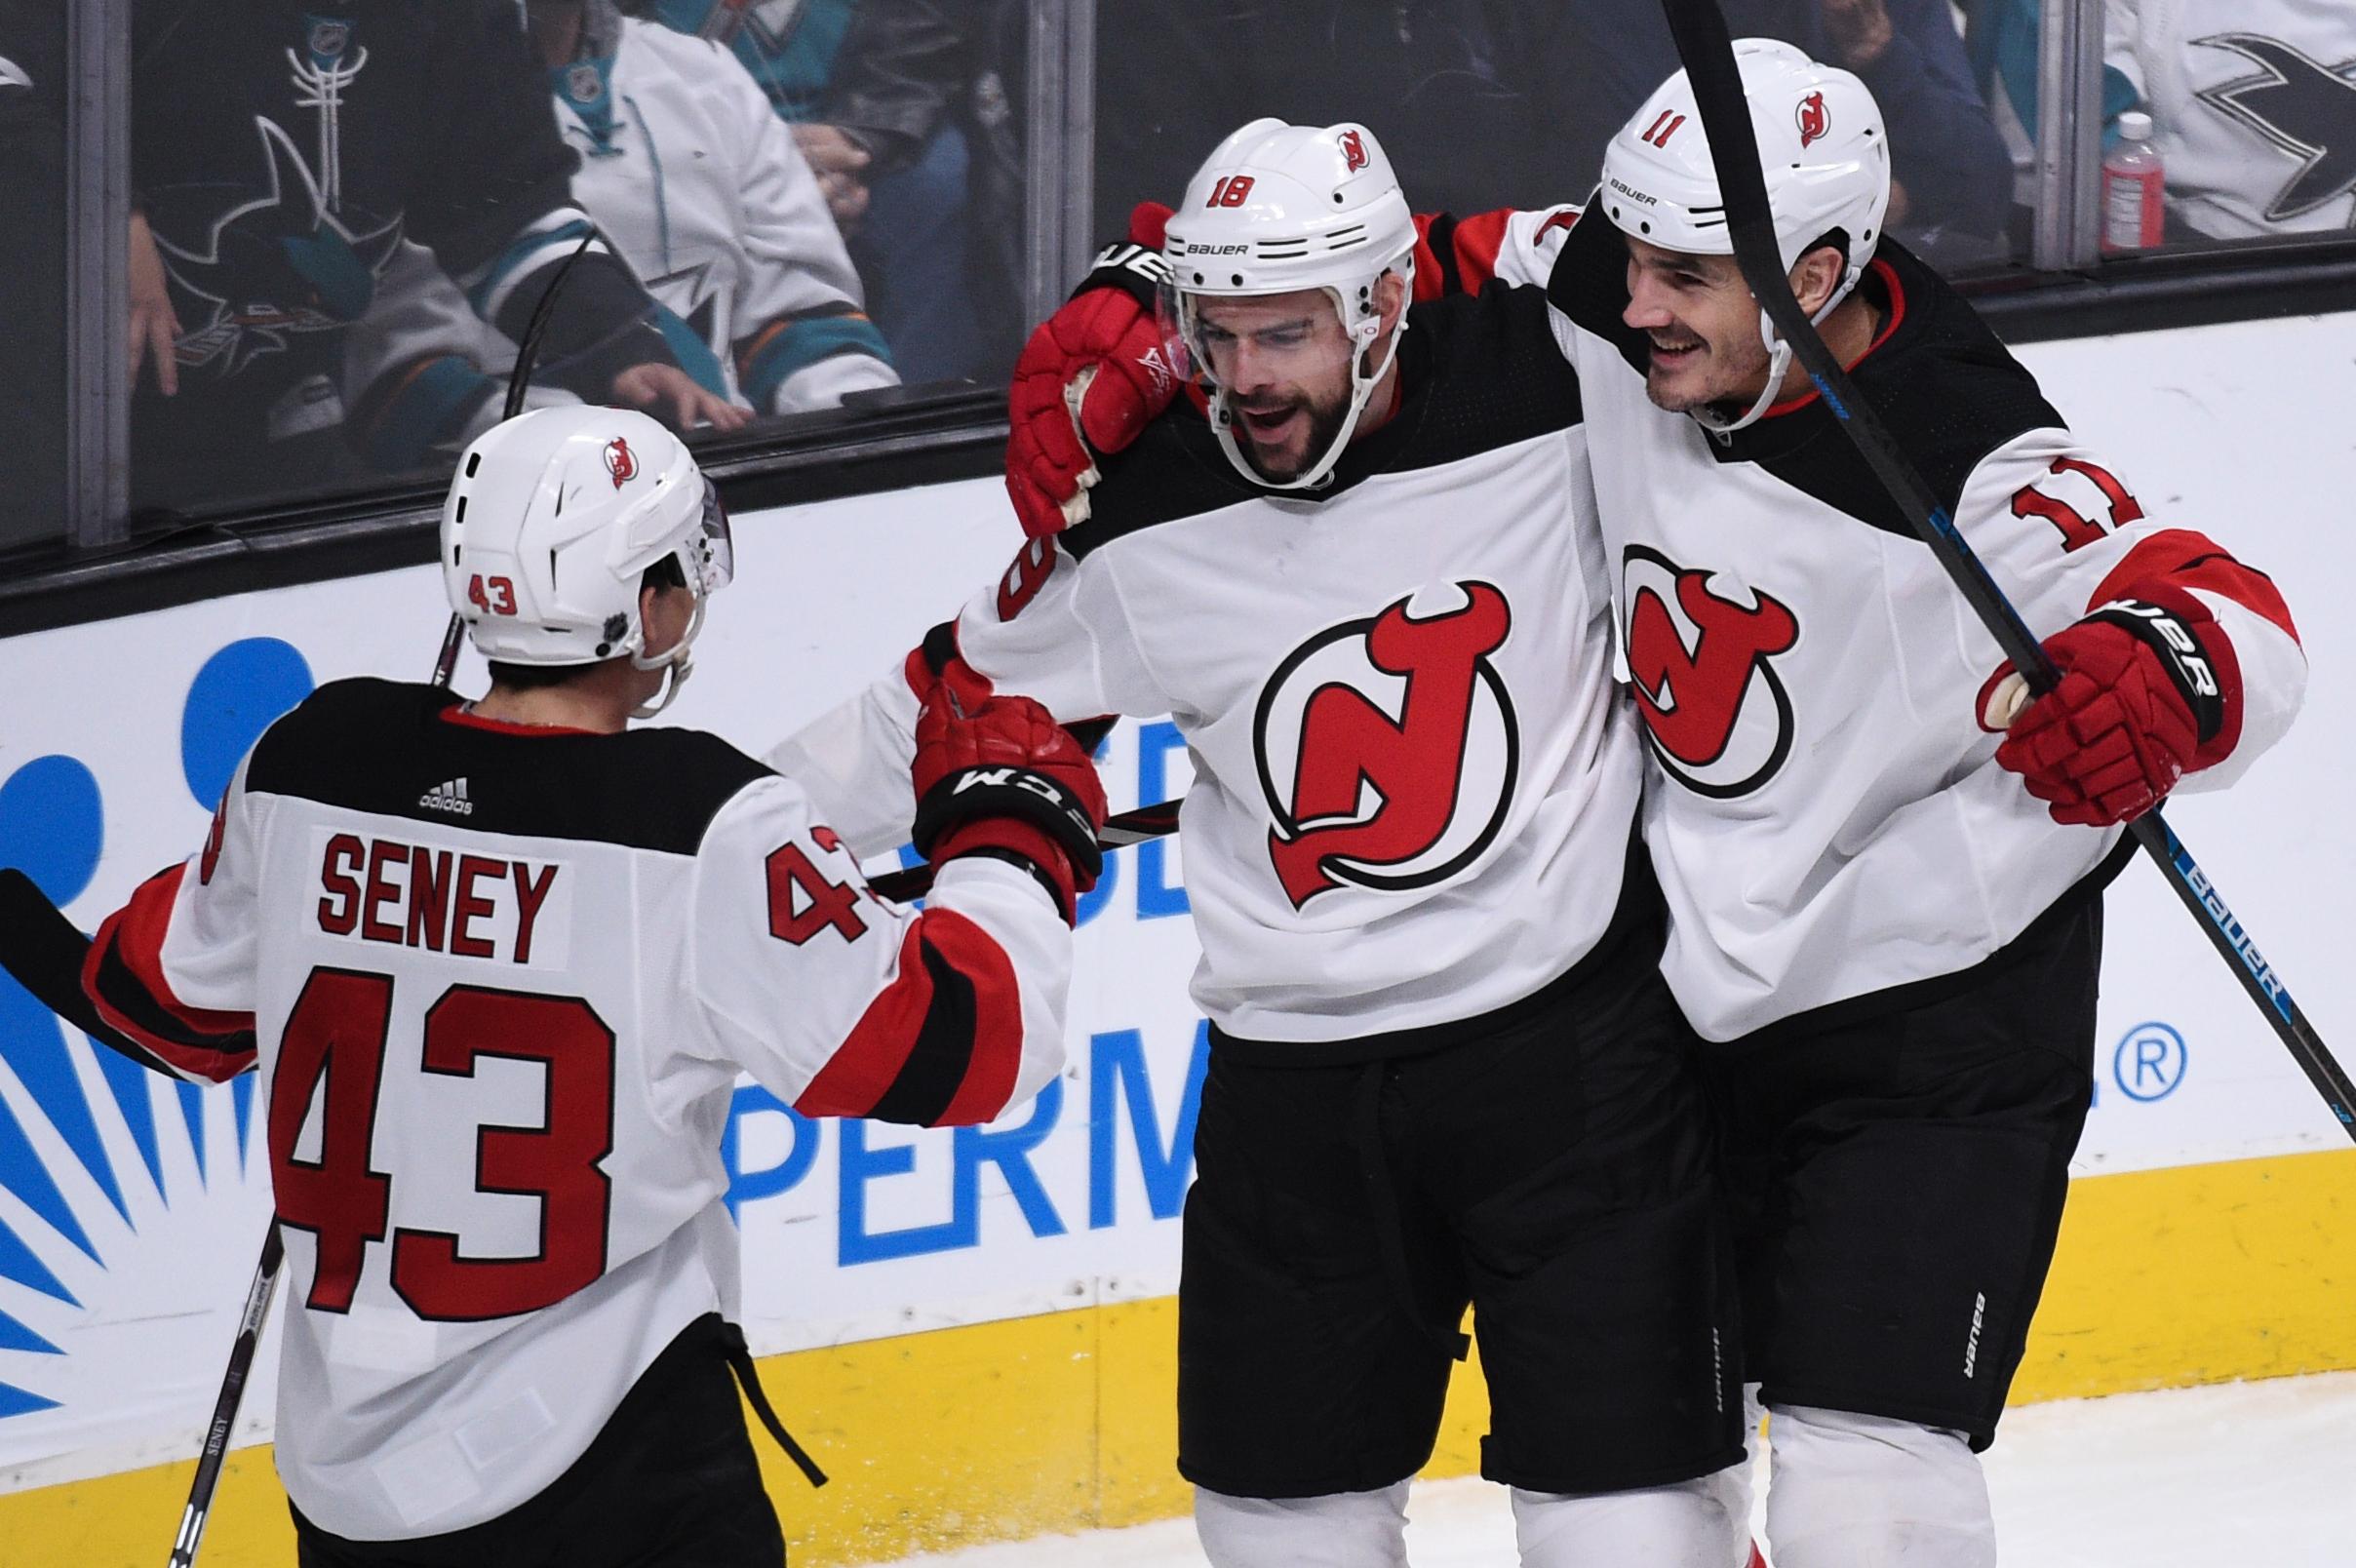 NHL: DEC 10 Devils at Sharks